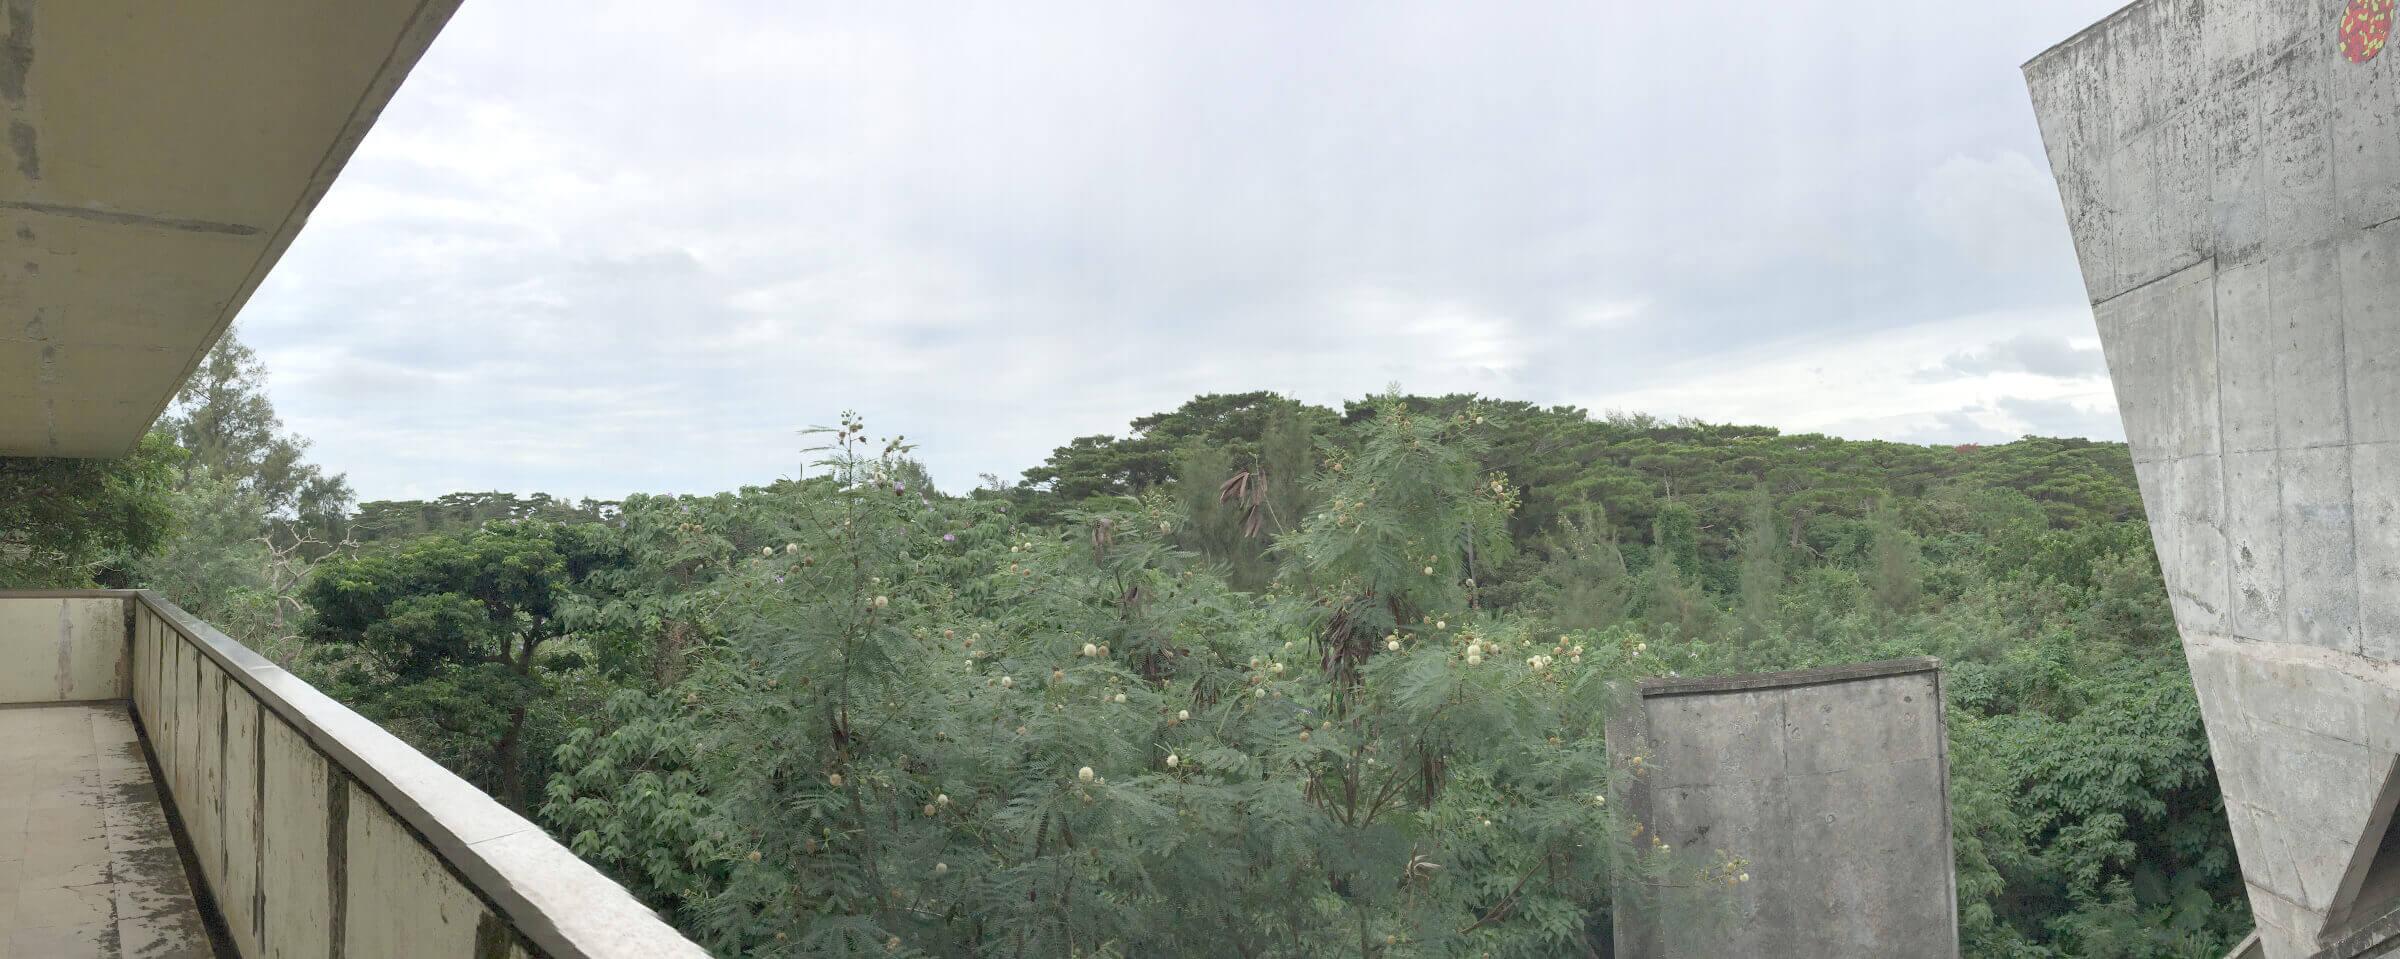 博物館裏の森林風景